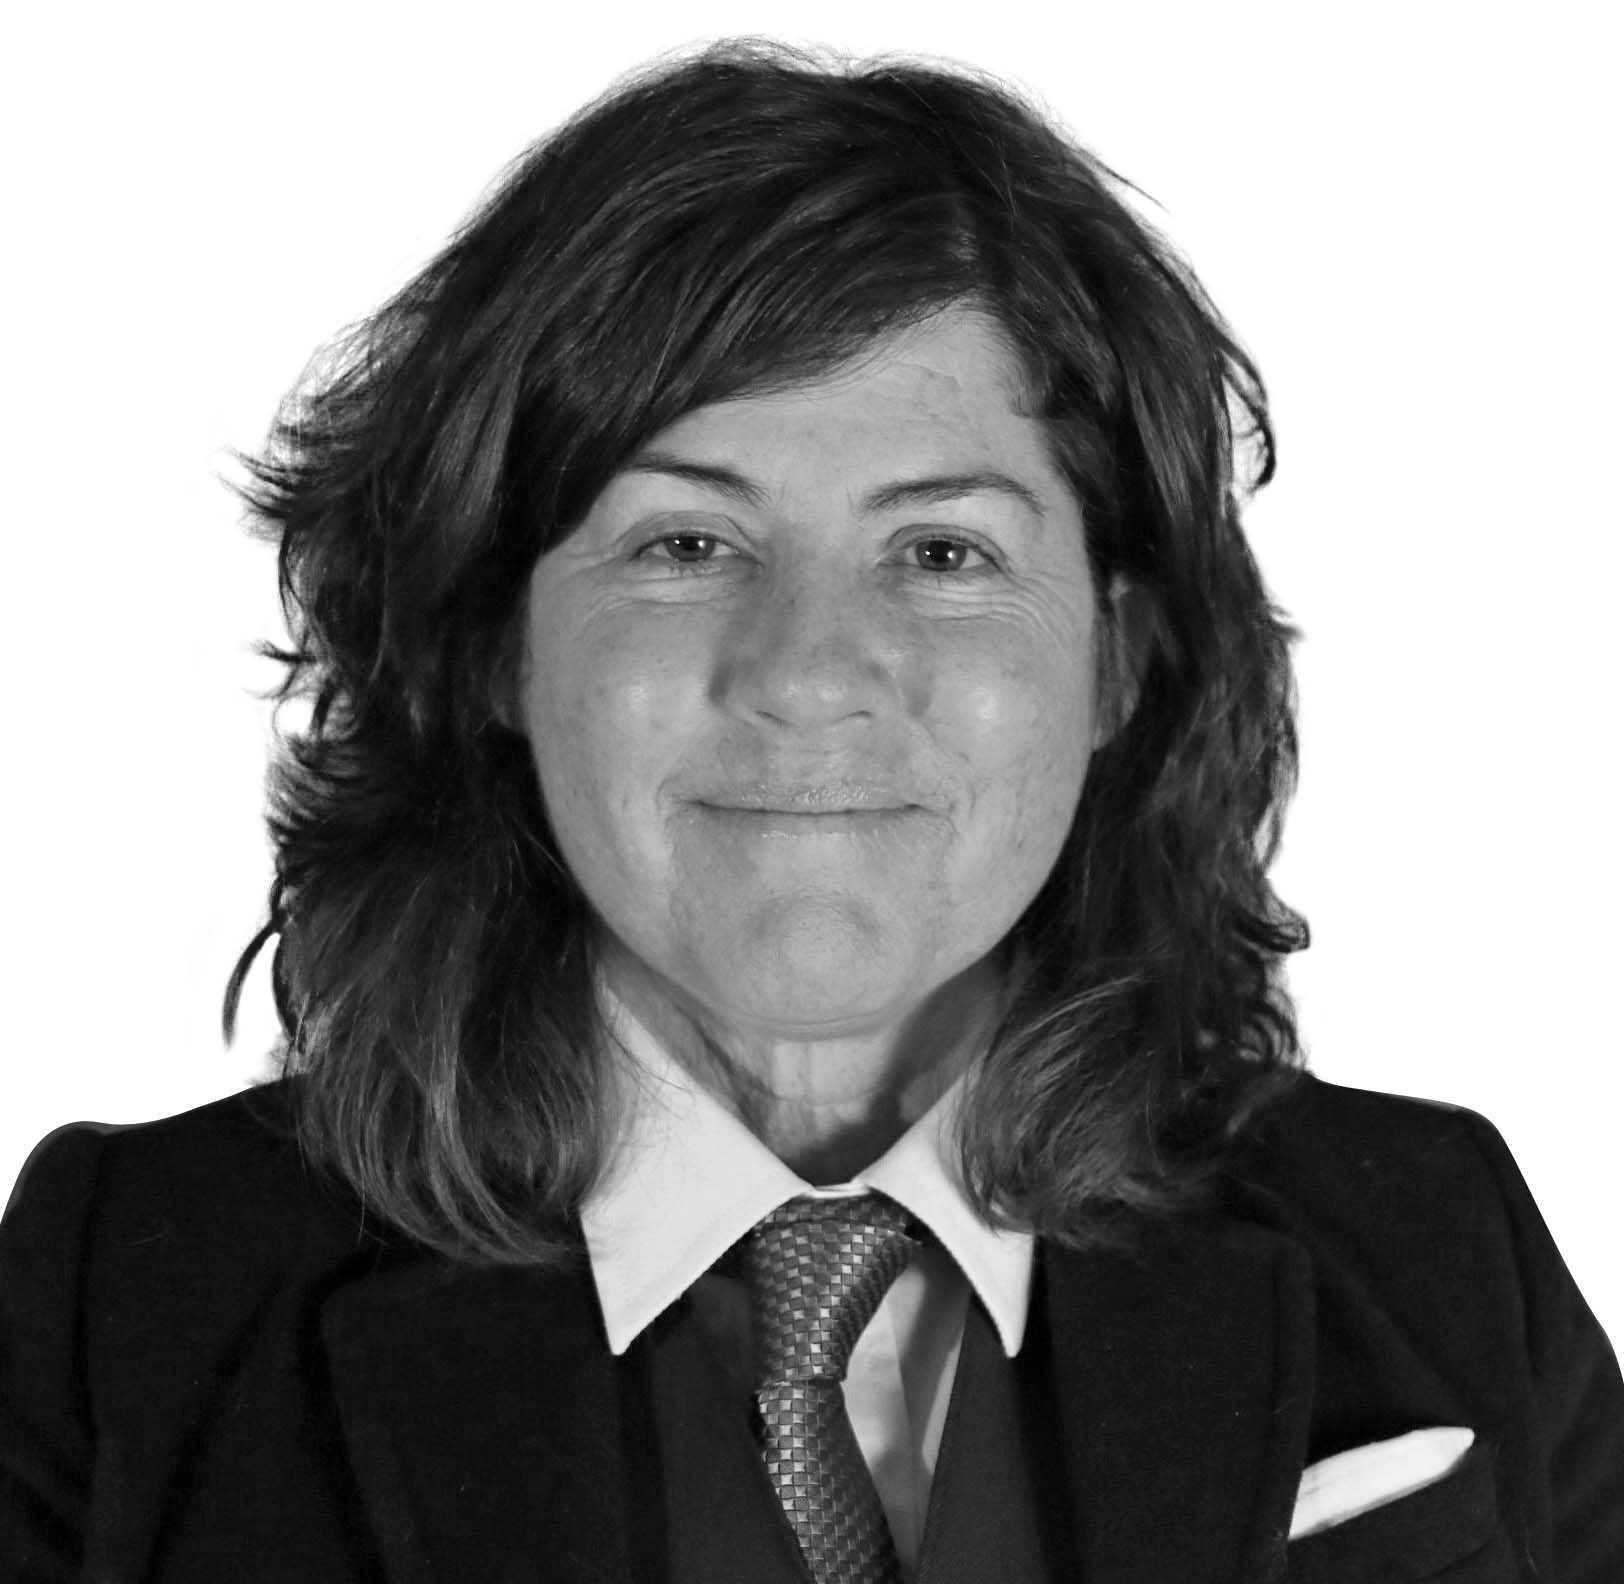 Vicki Gaubeca, Director